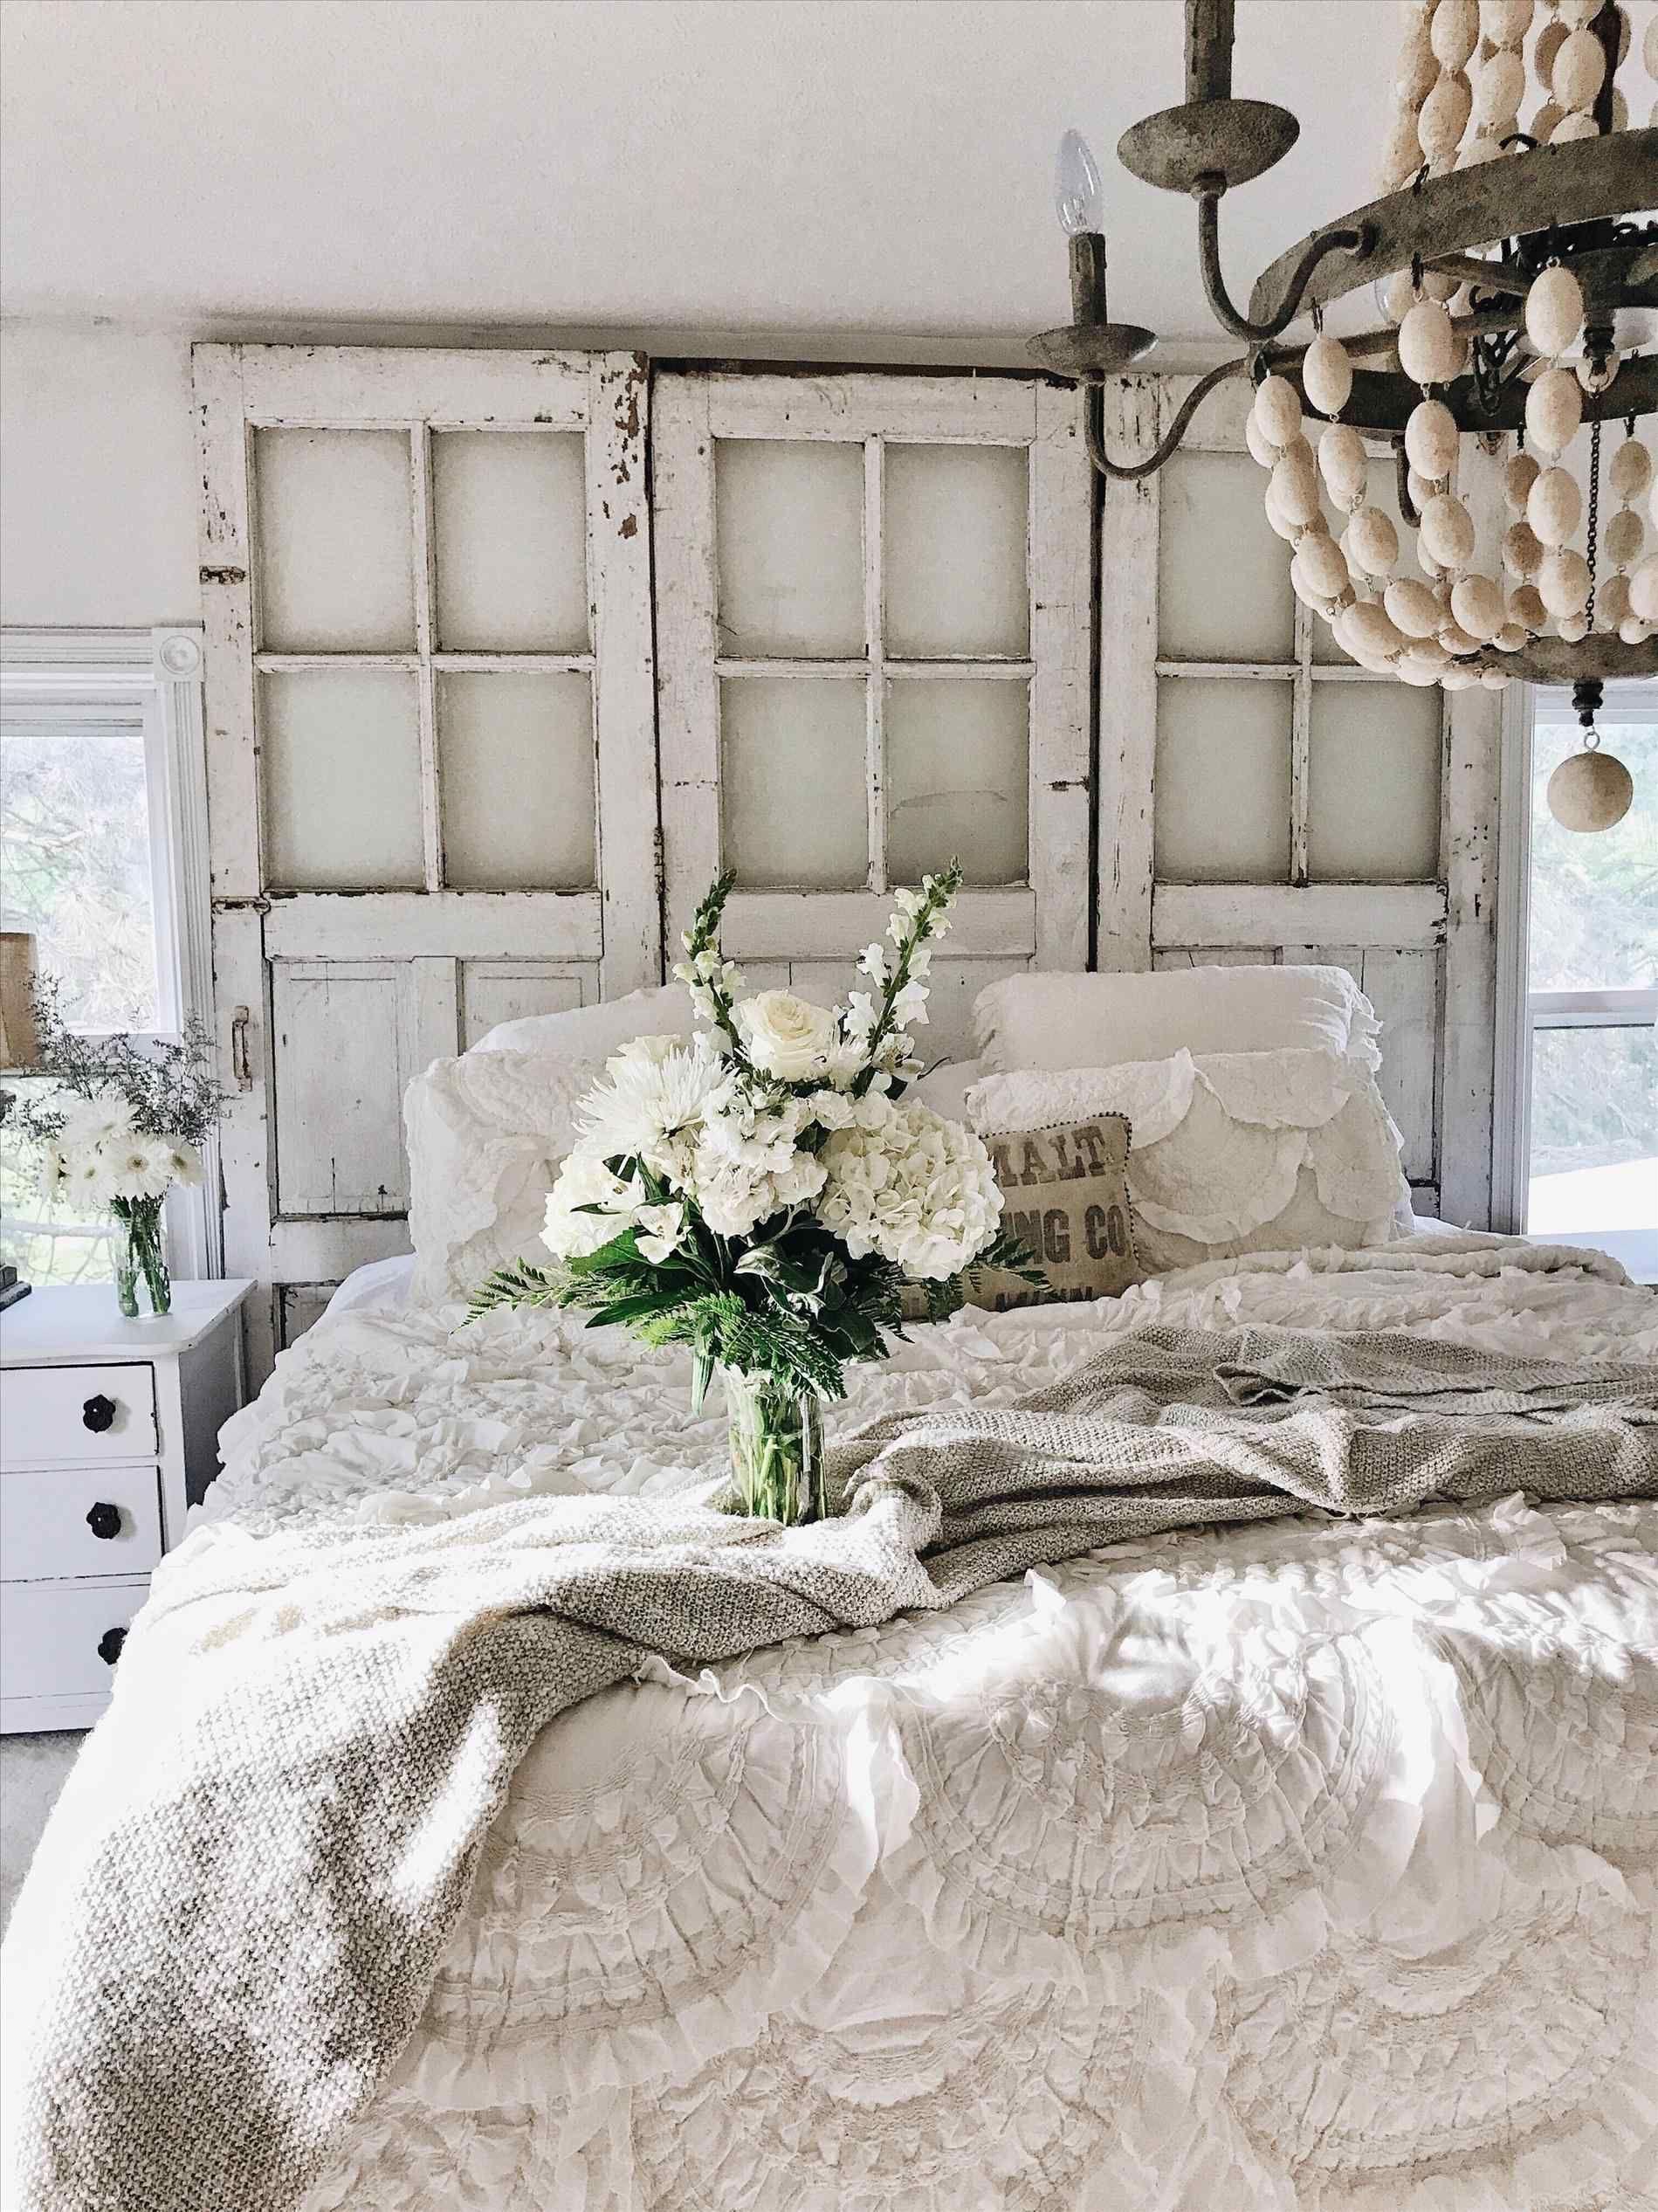 Decorating Your Boho Shabby Chic Bedroom